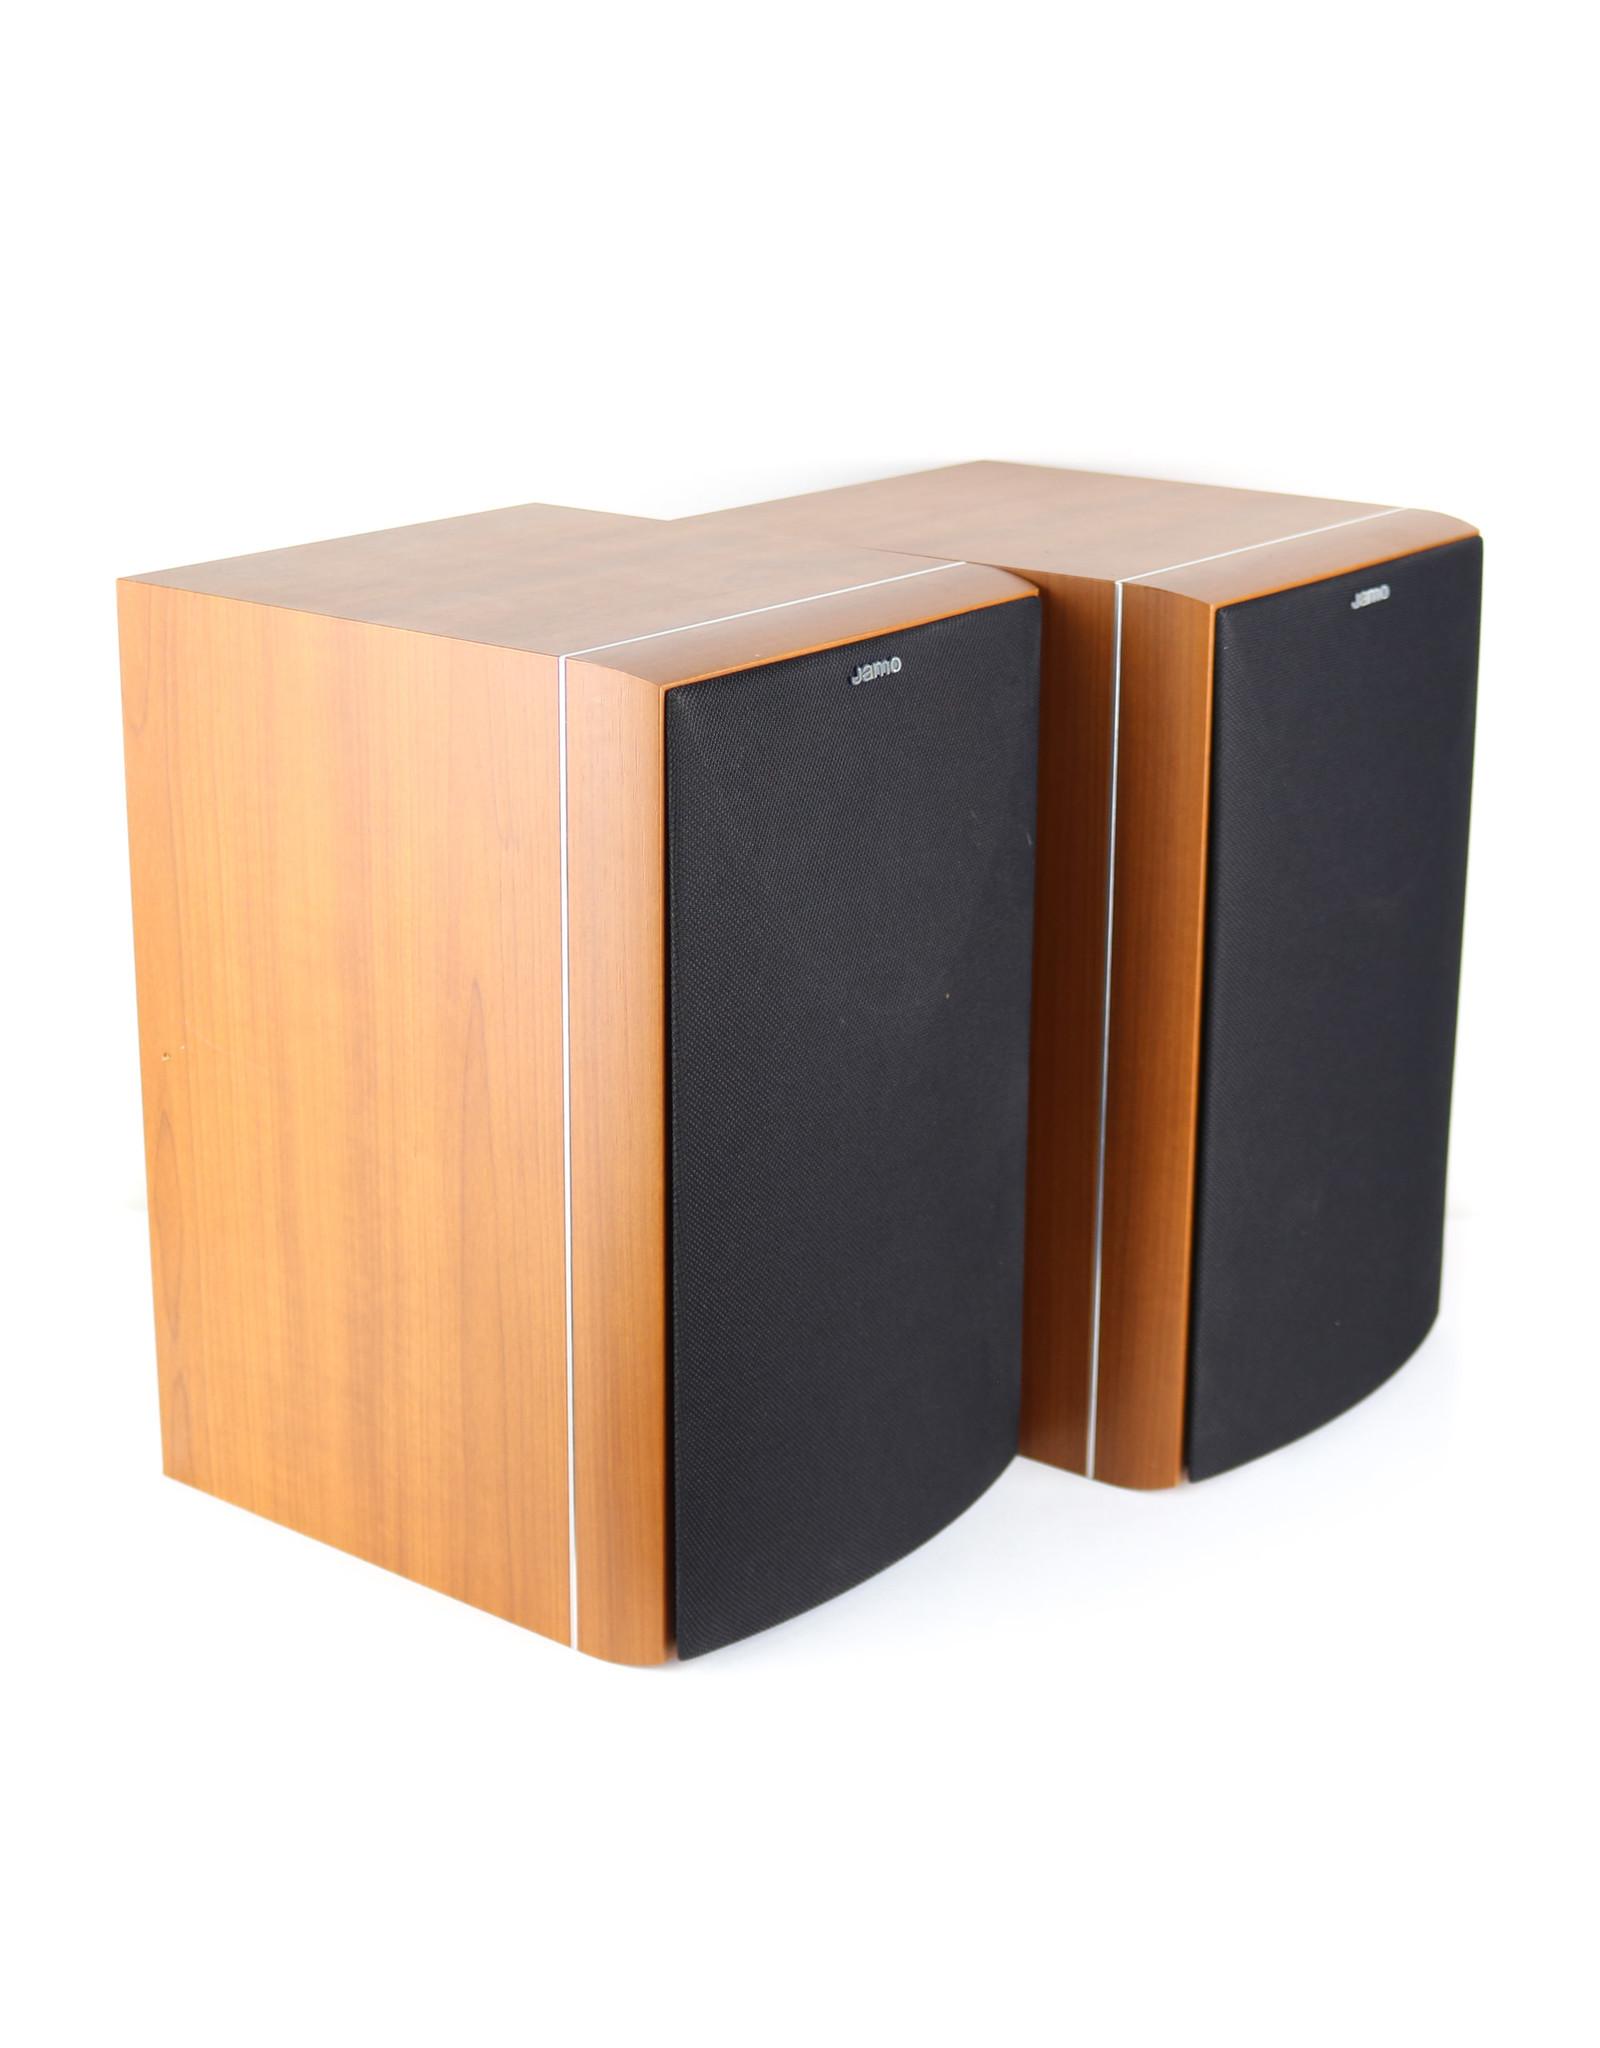 Jamo Jamo E610 Bookshelf Speakers Cherry USED